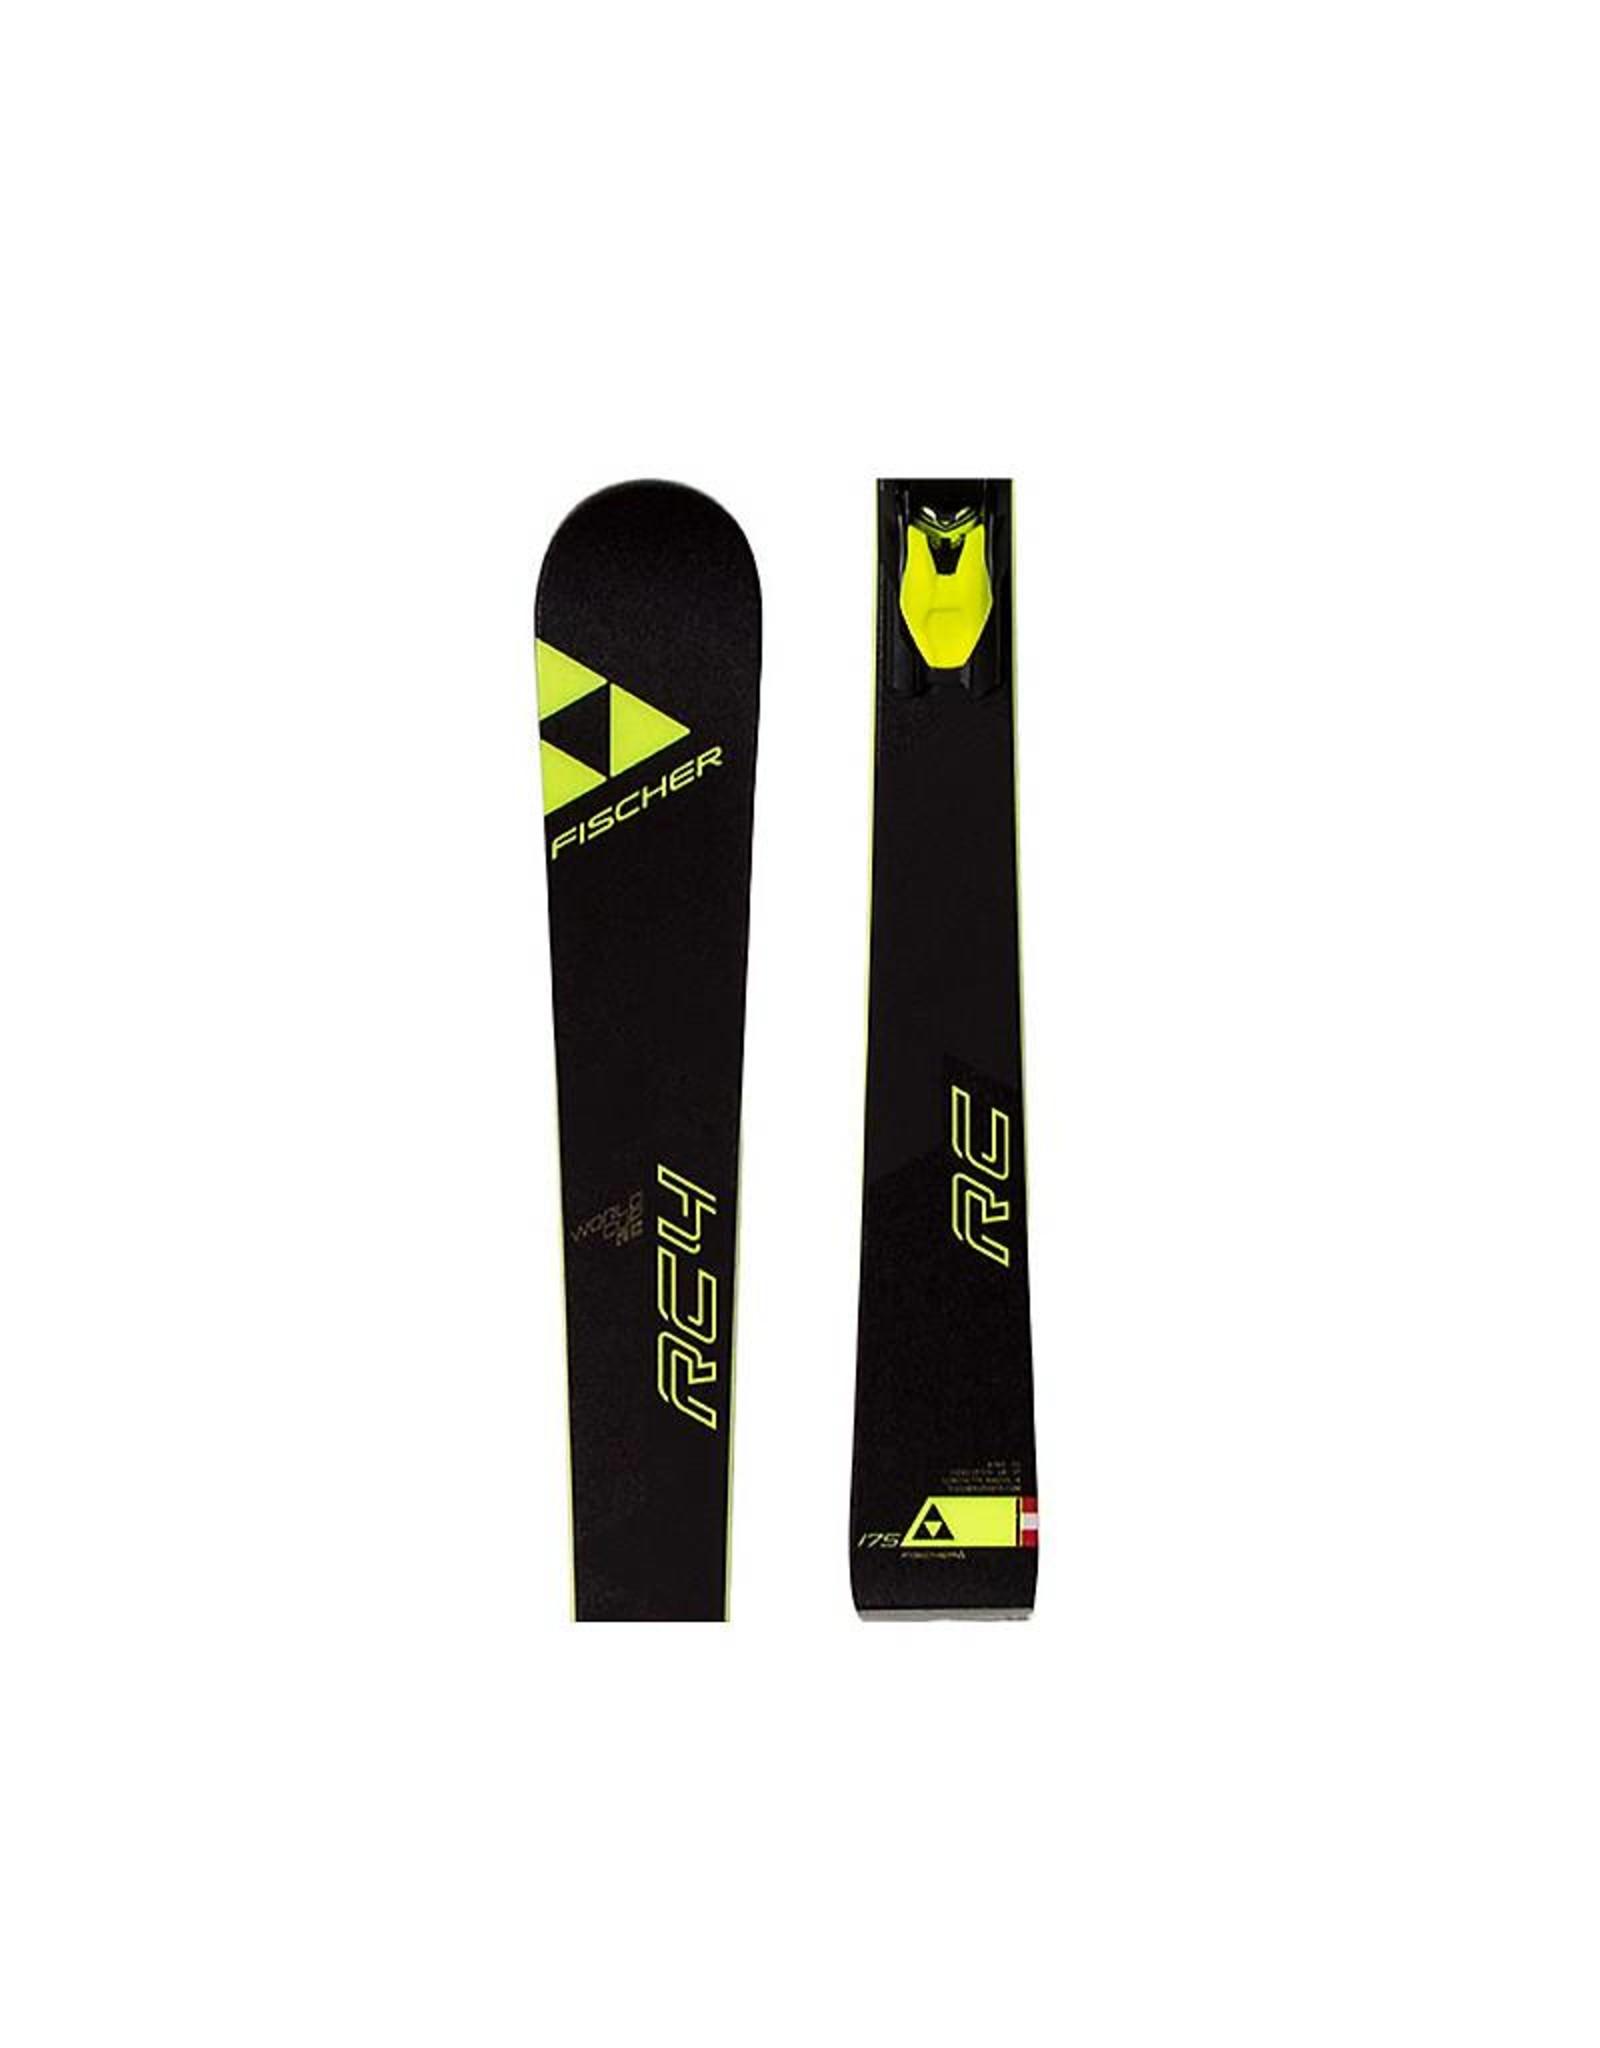 FISCHER Fischer RC4 Worldcup RC (n) Ski's Gebruikt